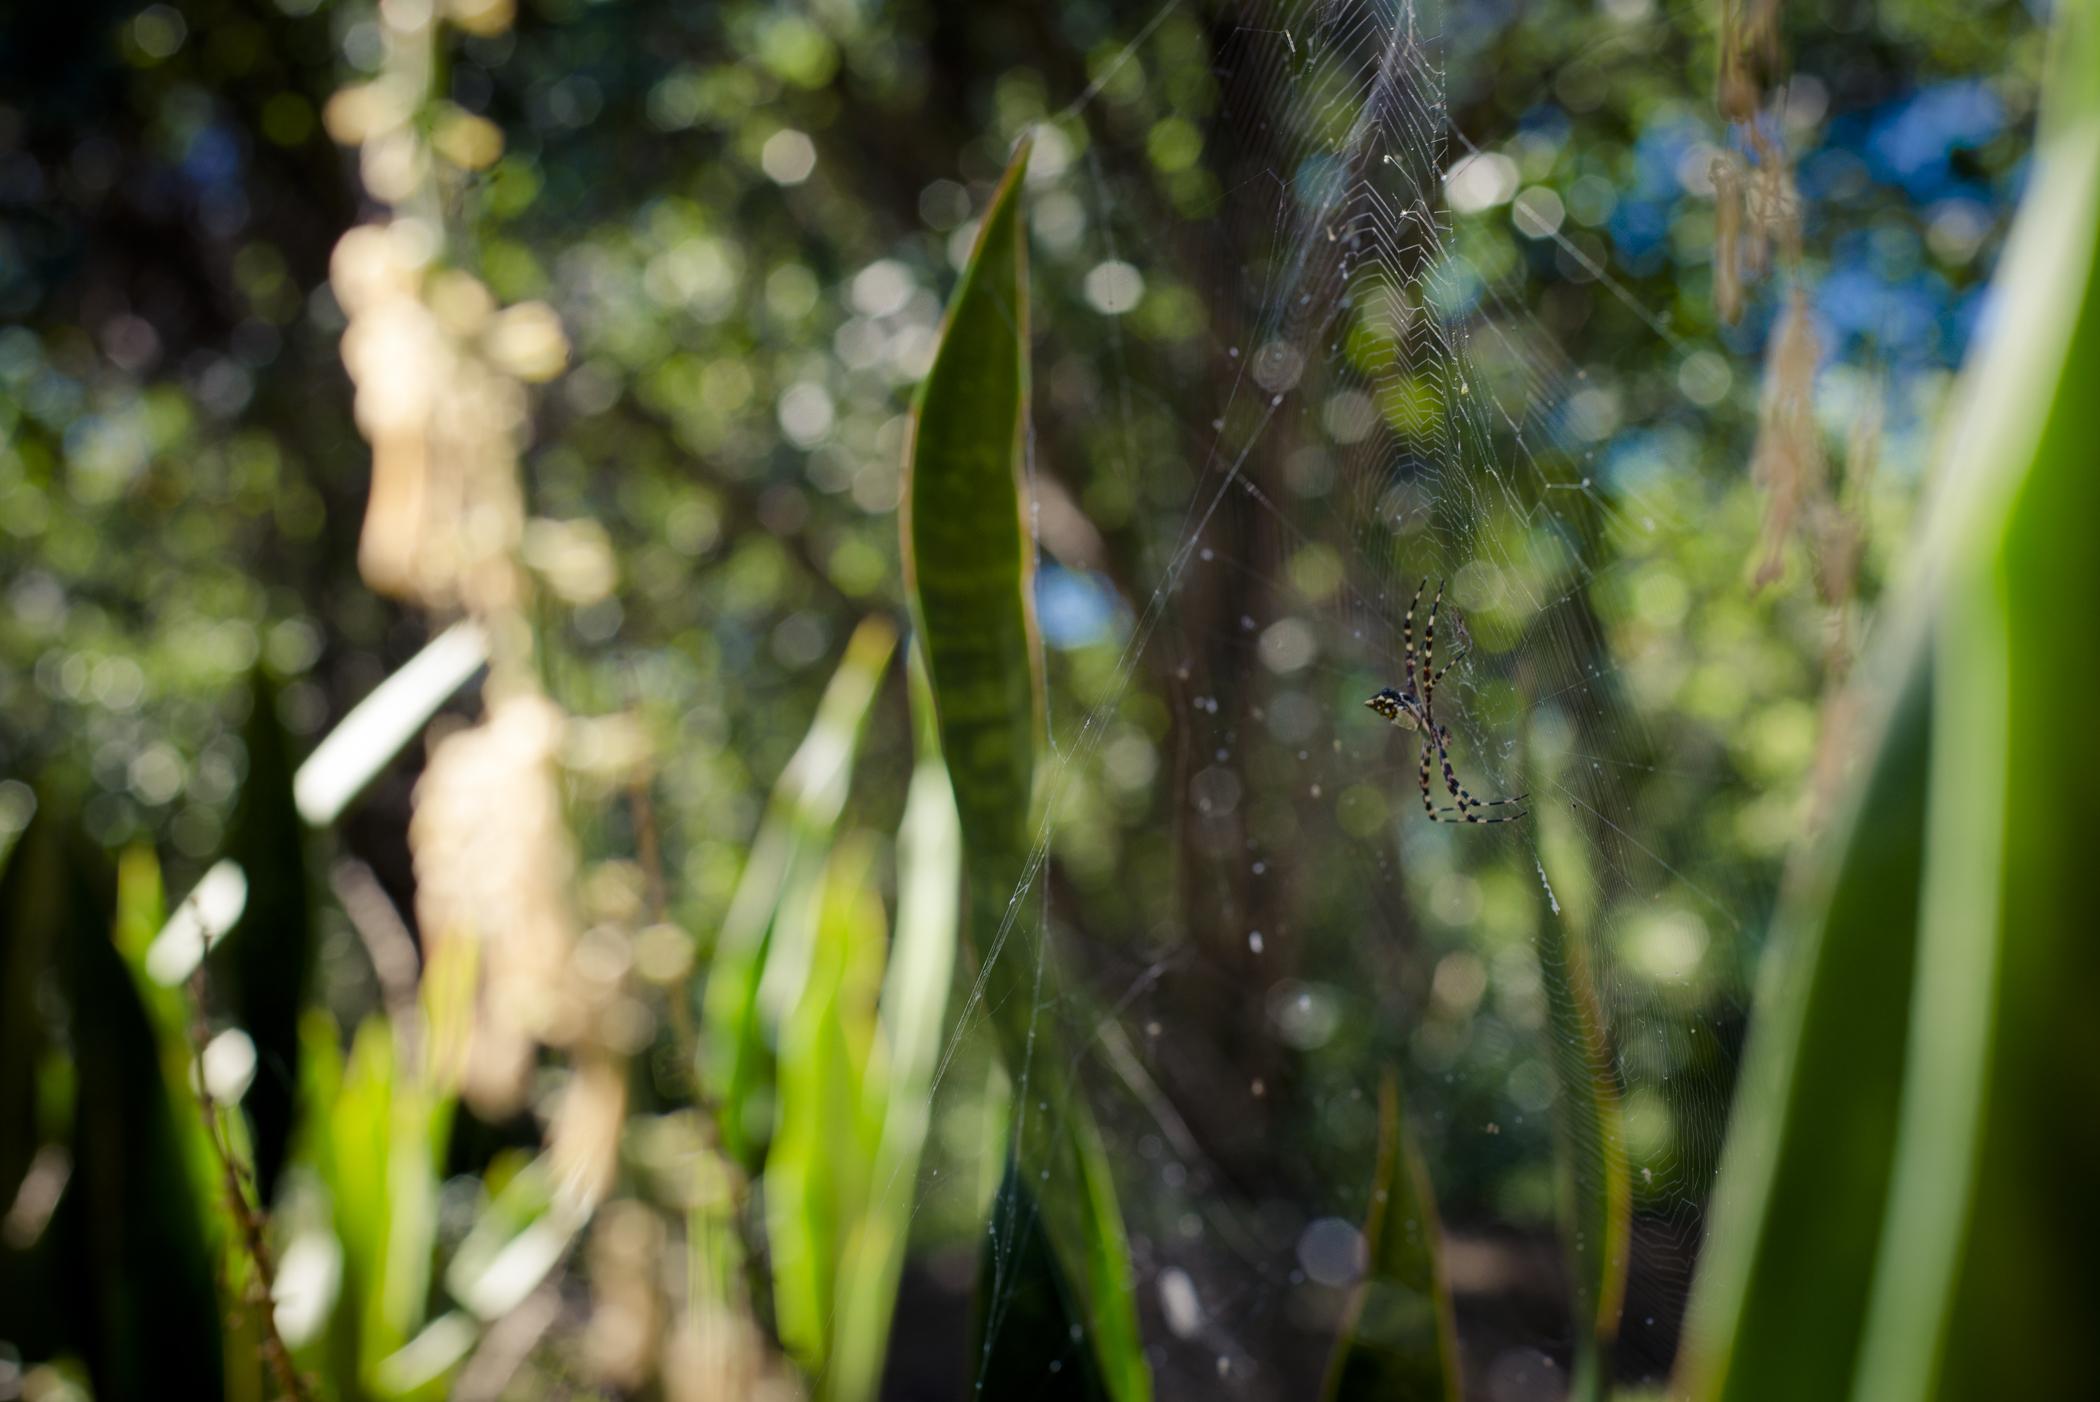 012014-Culebra-JuliaLuckettPhotography-34